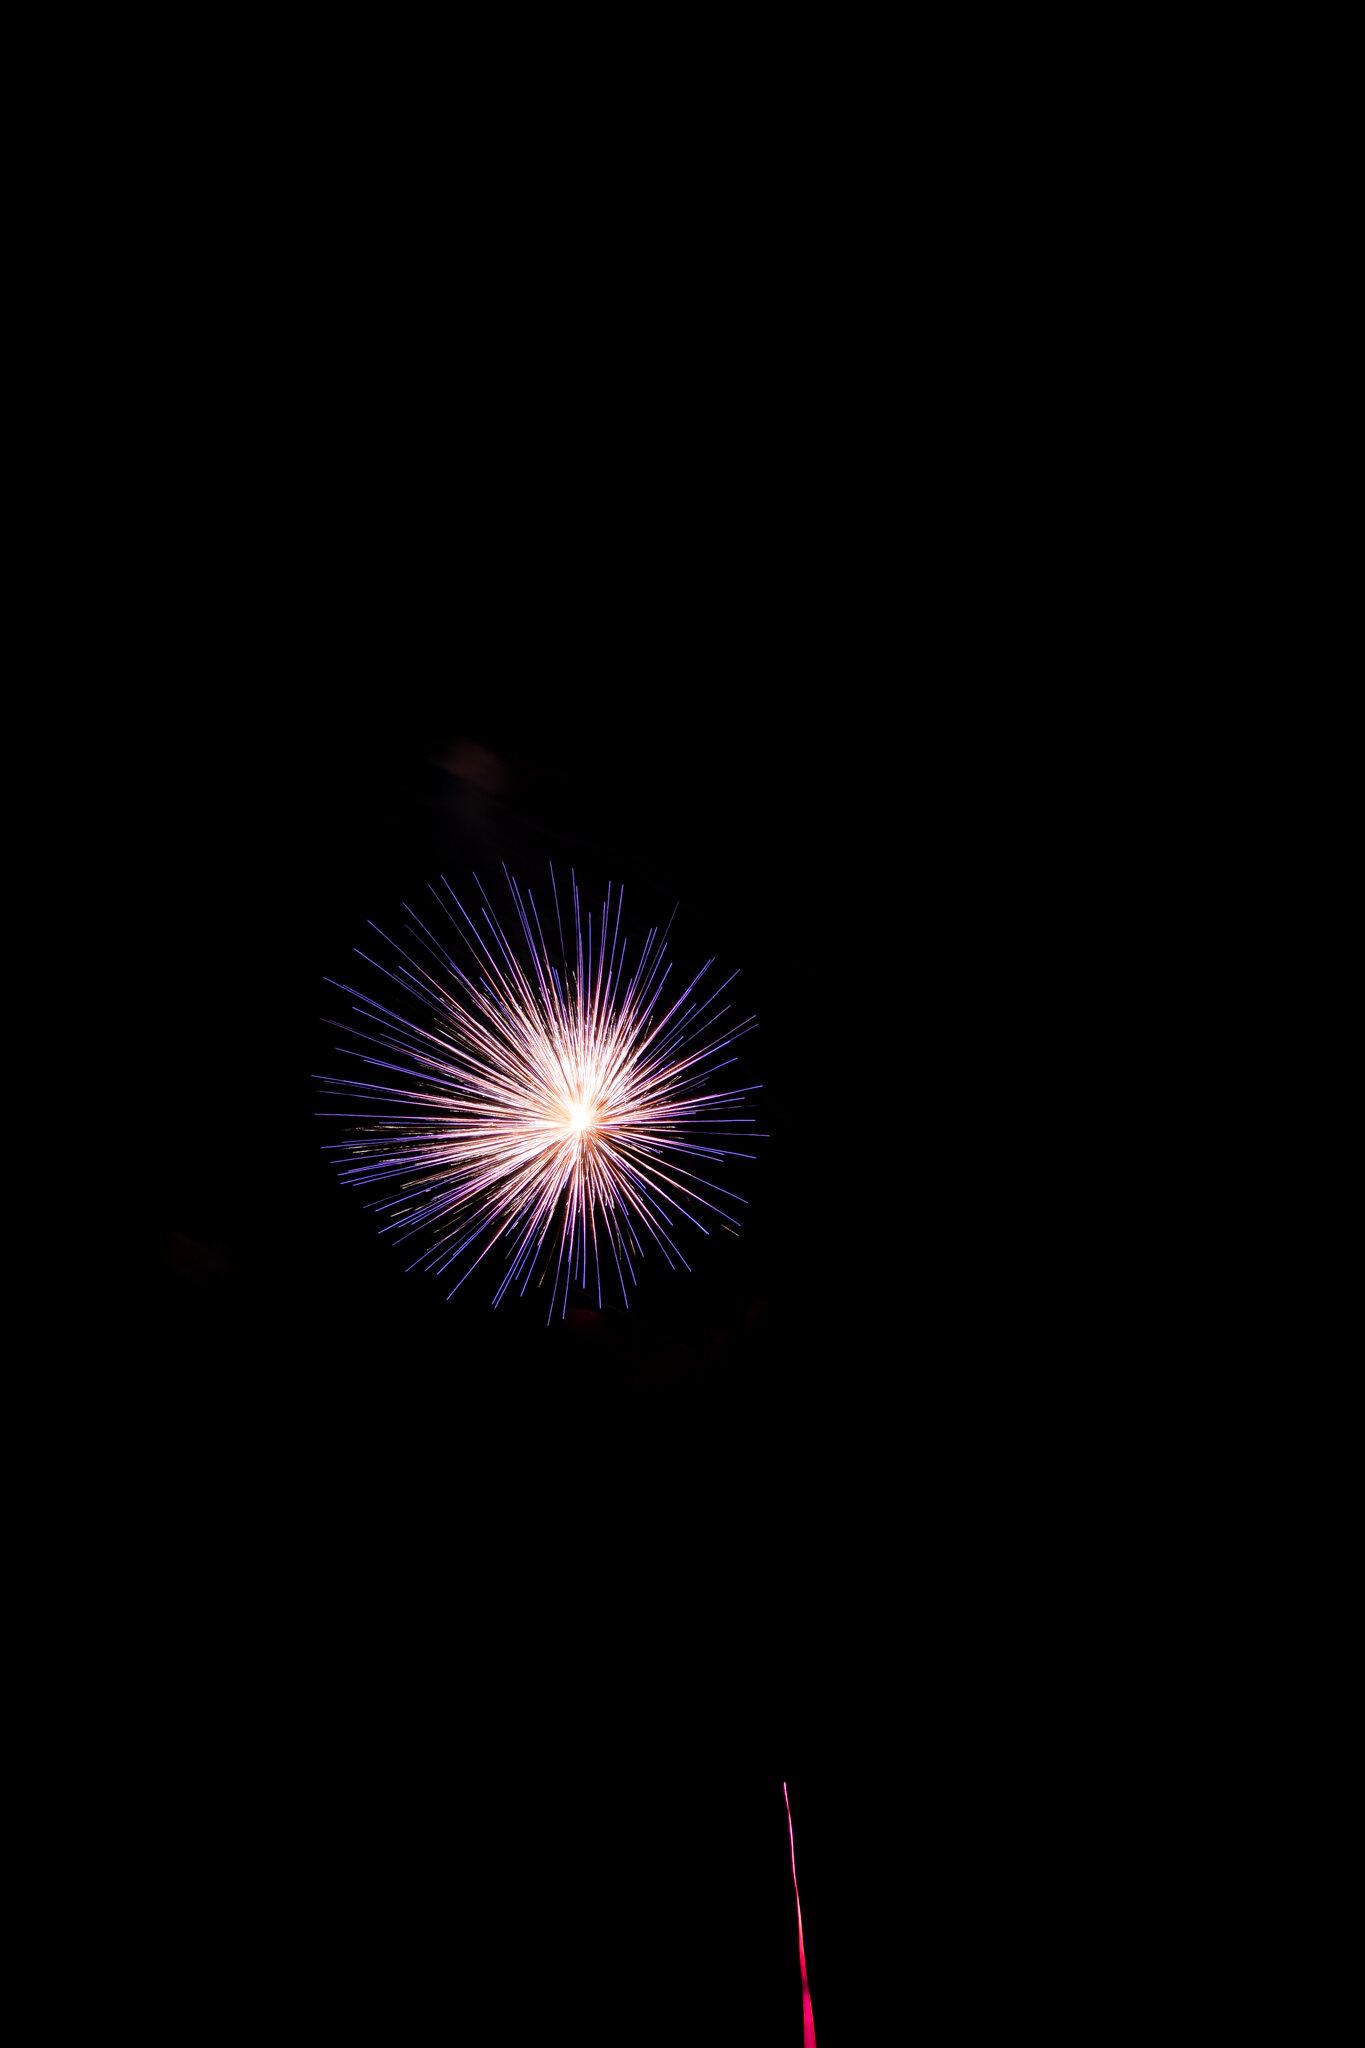 focuspulledfireworks-8.jpg